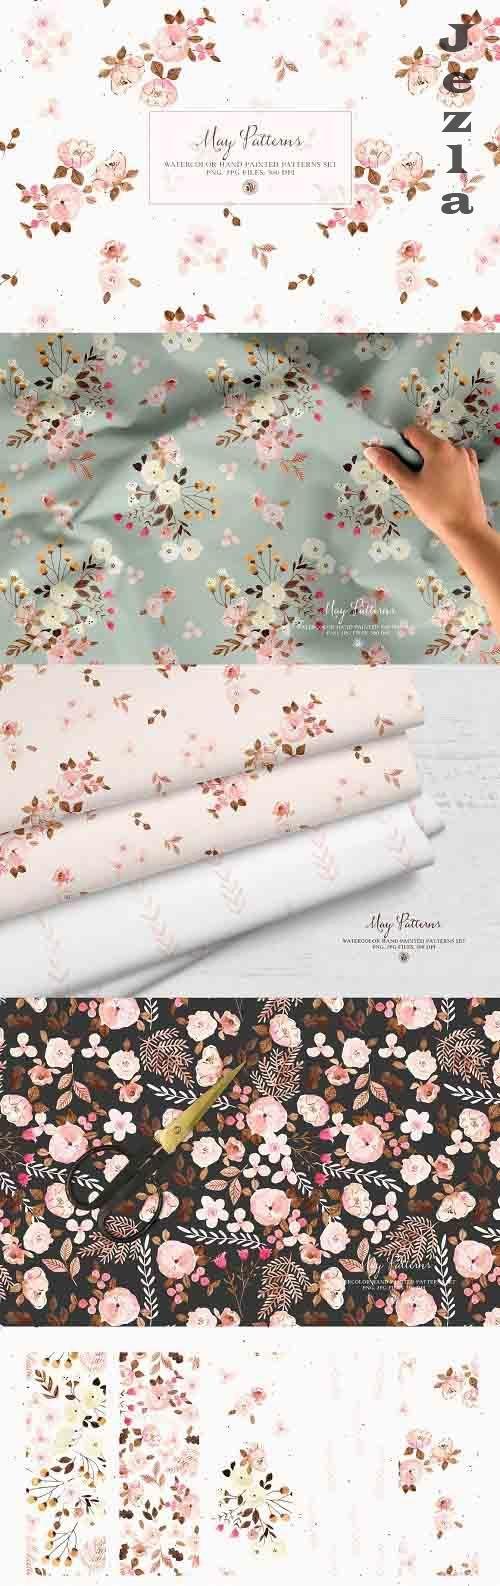 May Patterns - watercolor patterns - 6118936